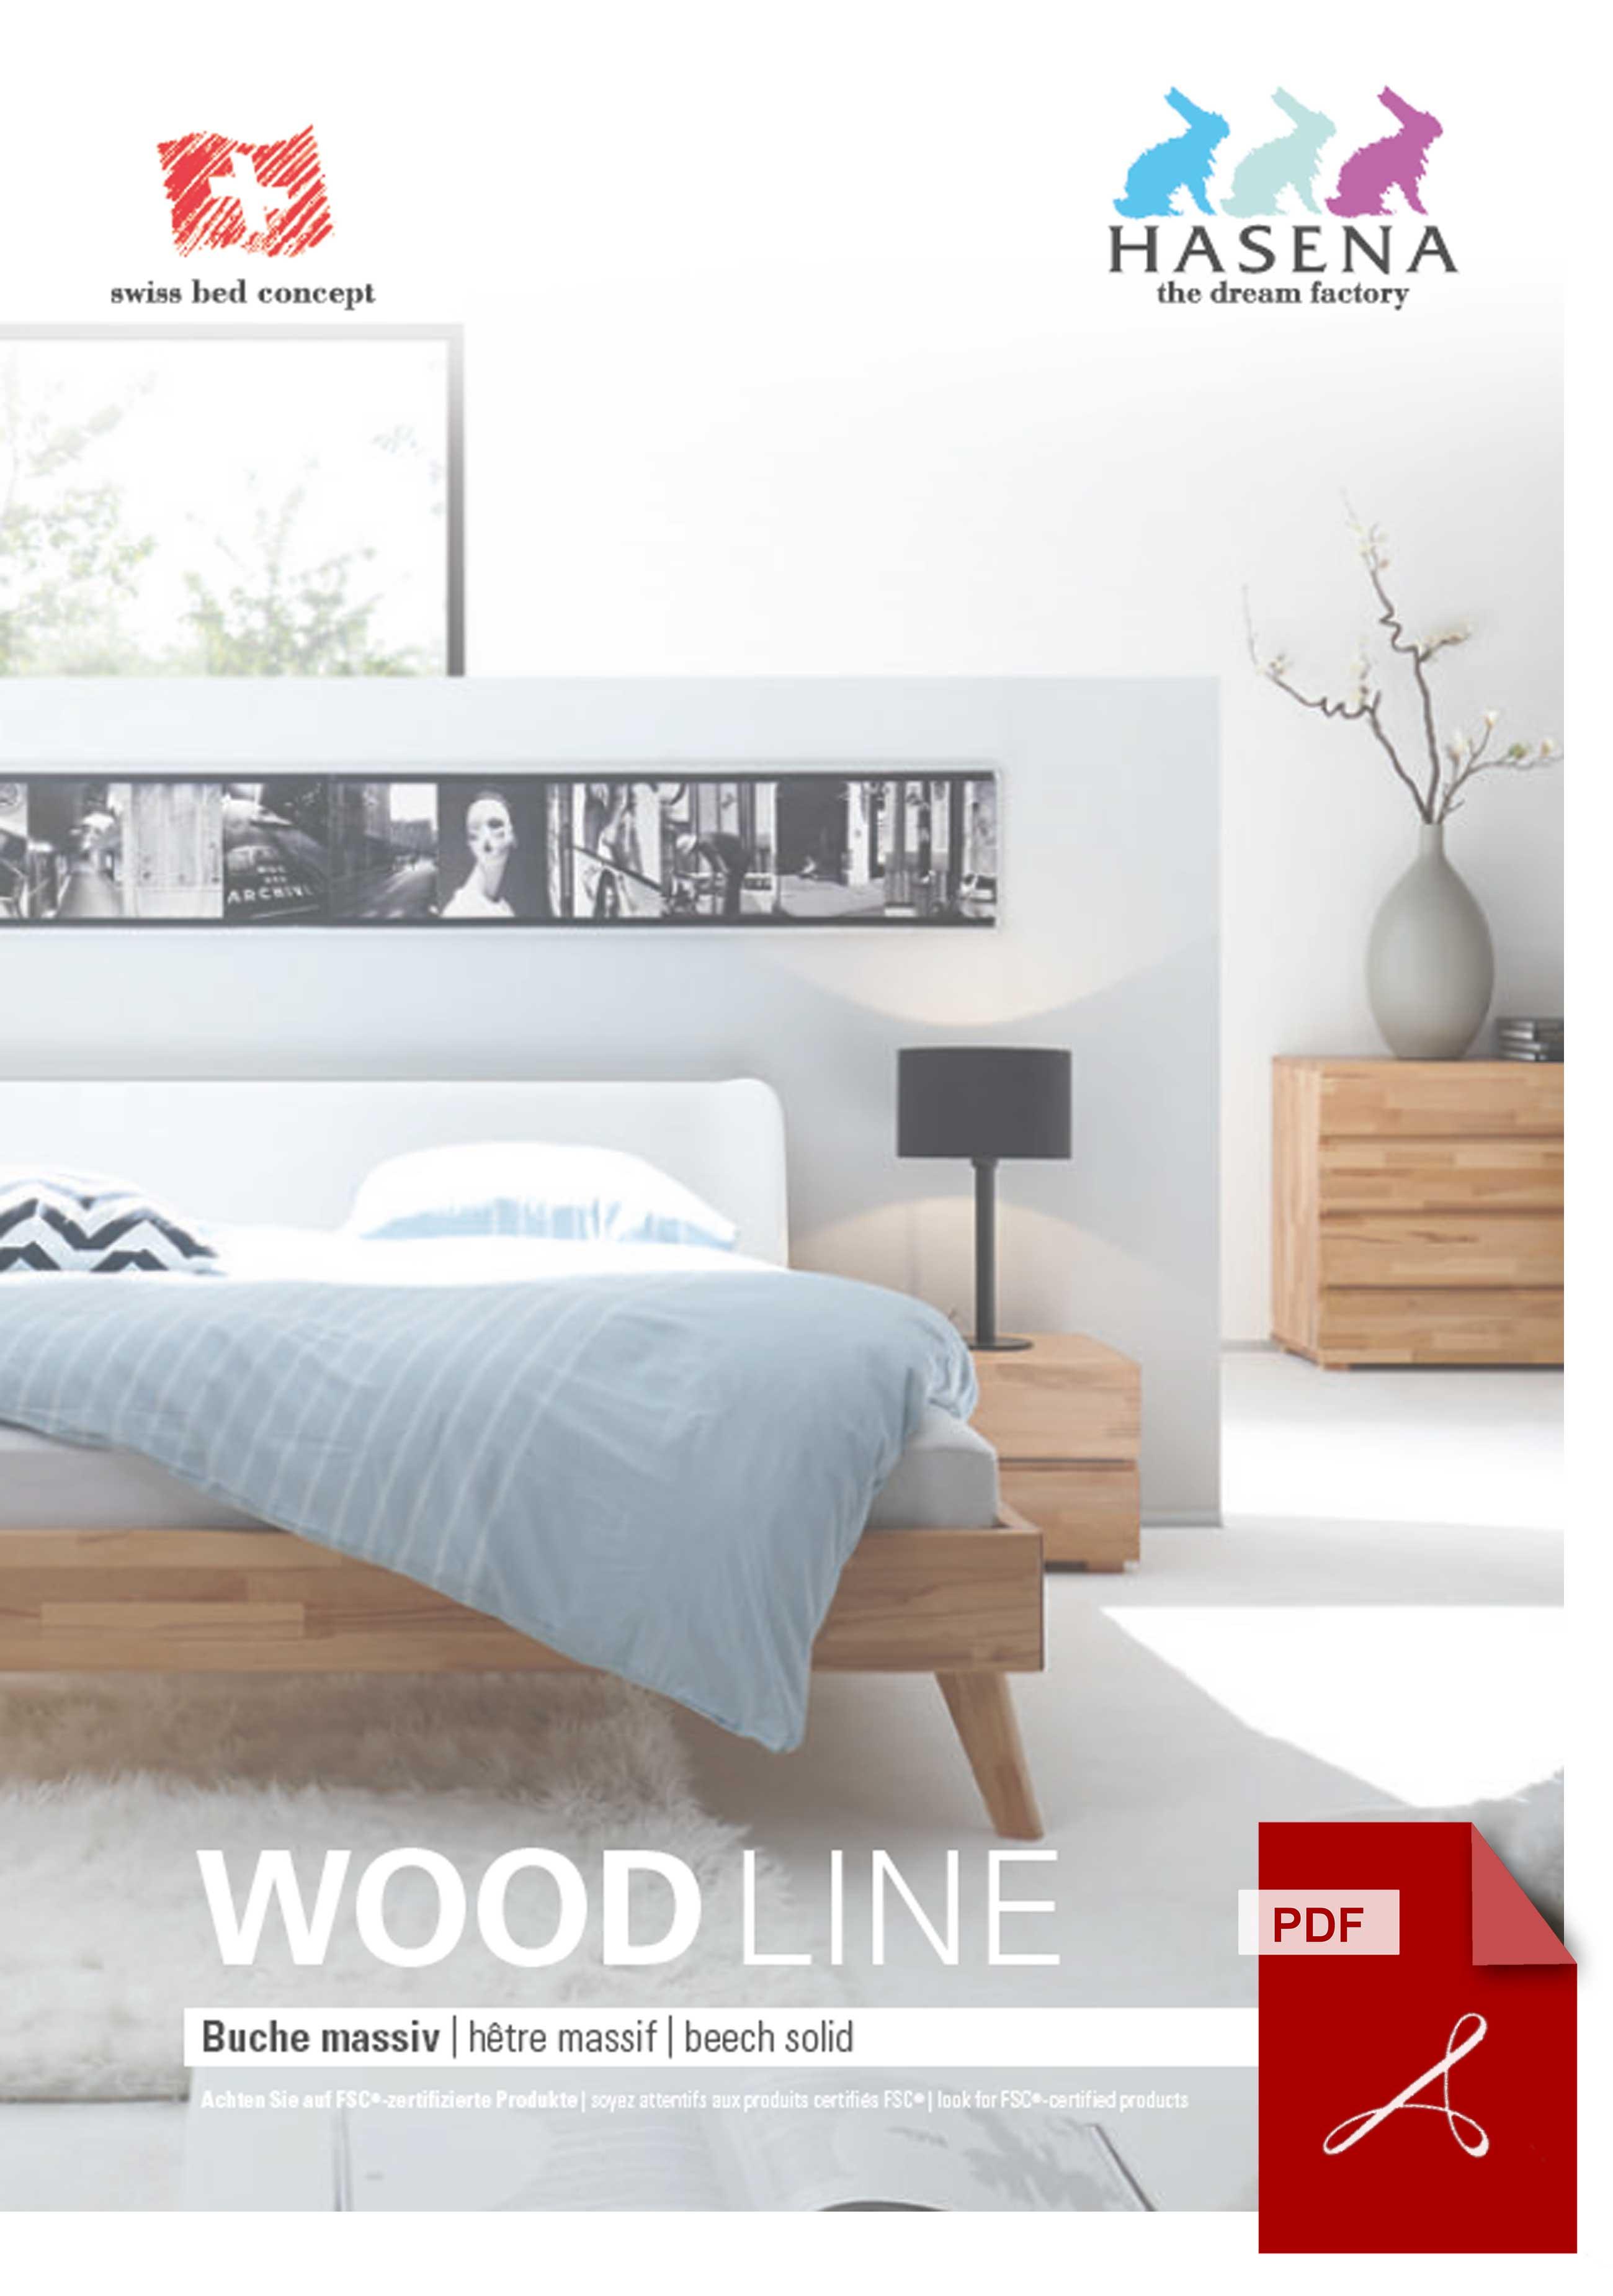 Hasena Wood Line Katalog als PDF Datei